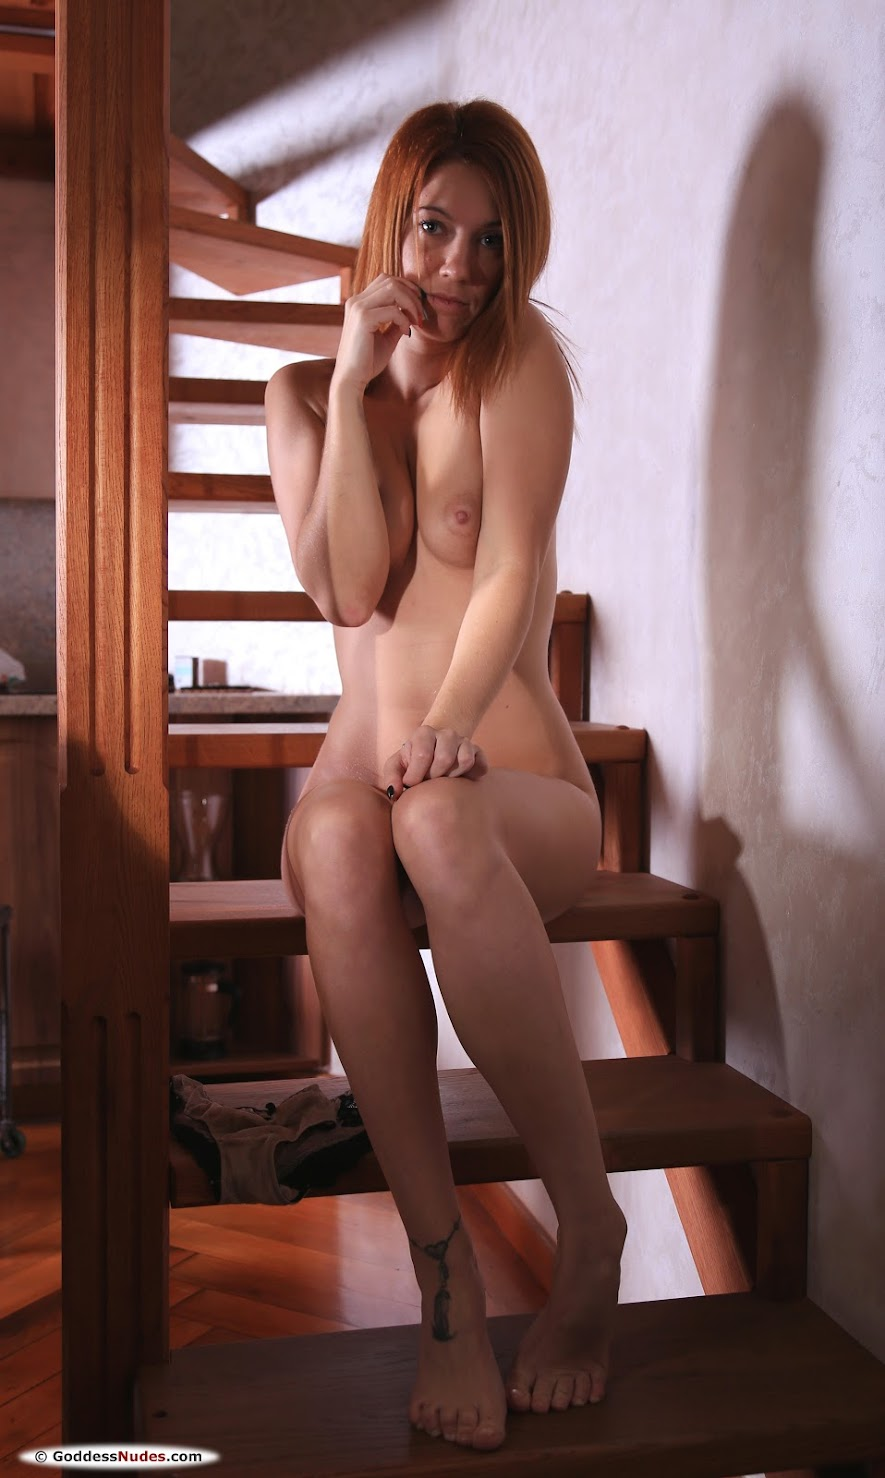 1615395230__goddess-blicka-1-cover [GoddessNudes] Blicka - Photoset 01